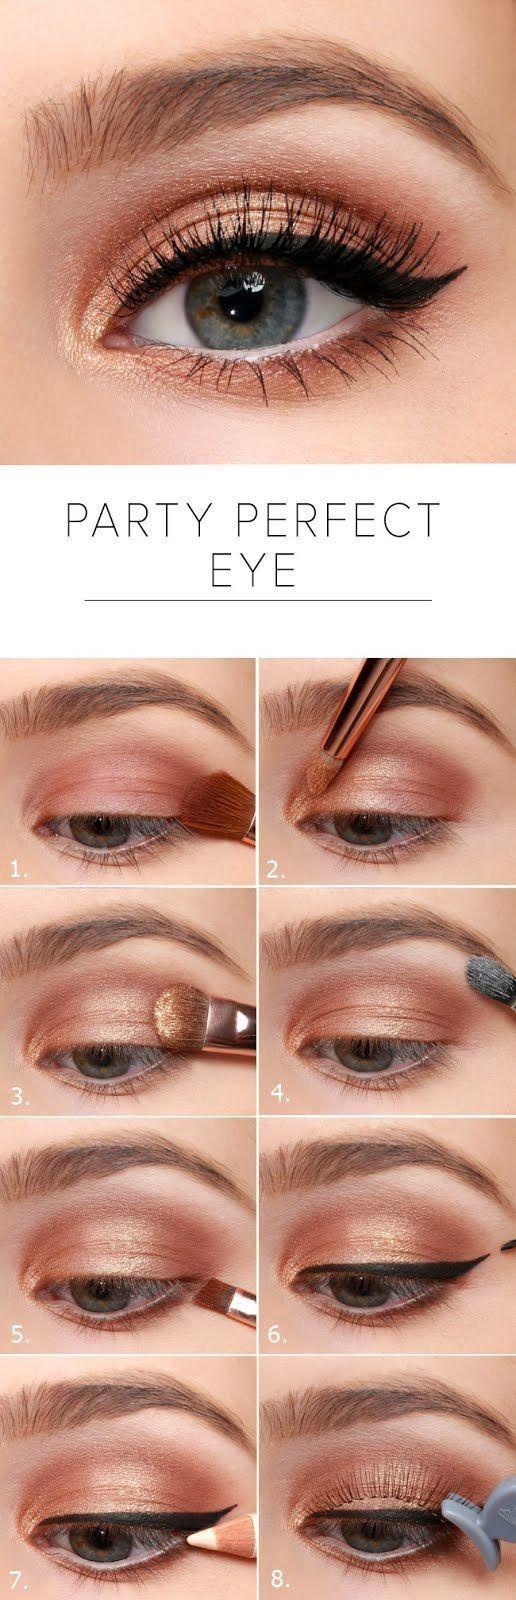 Soft cut-crease metallic eye - Pinmakeup #beautyeyes